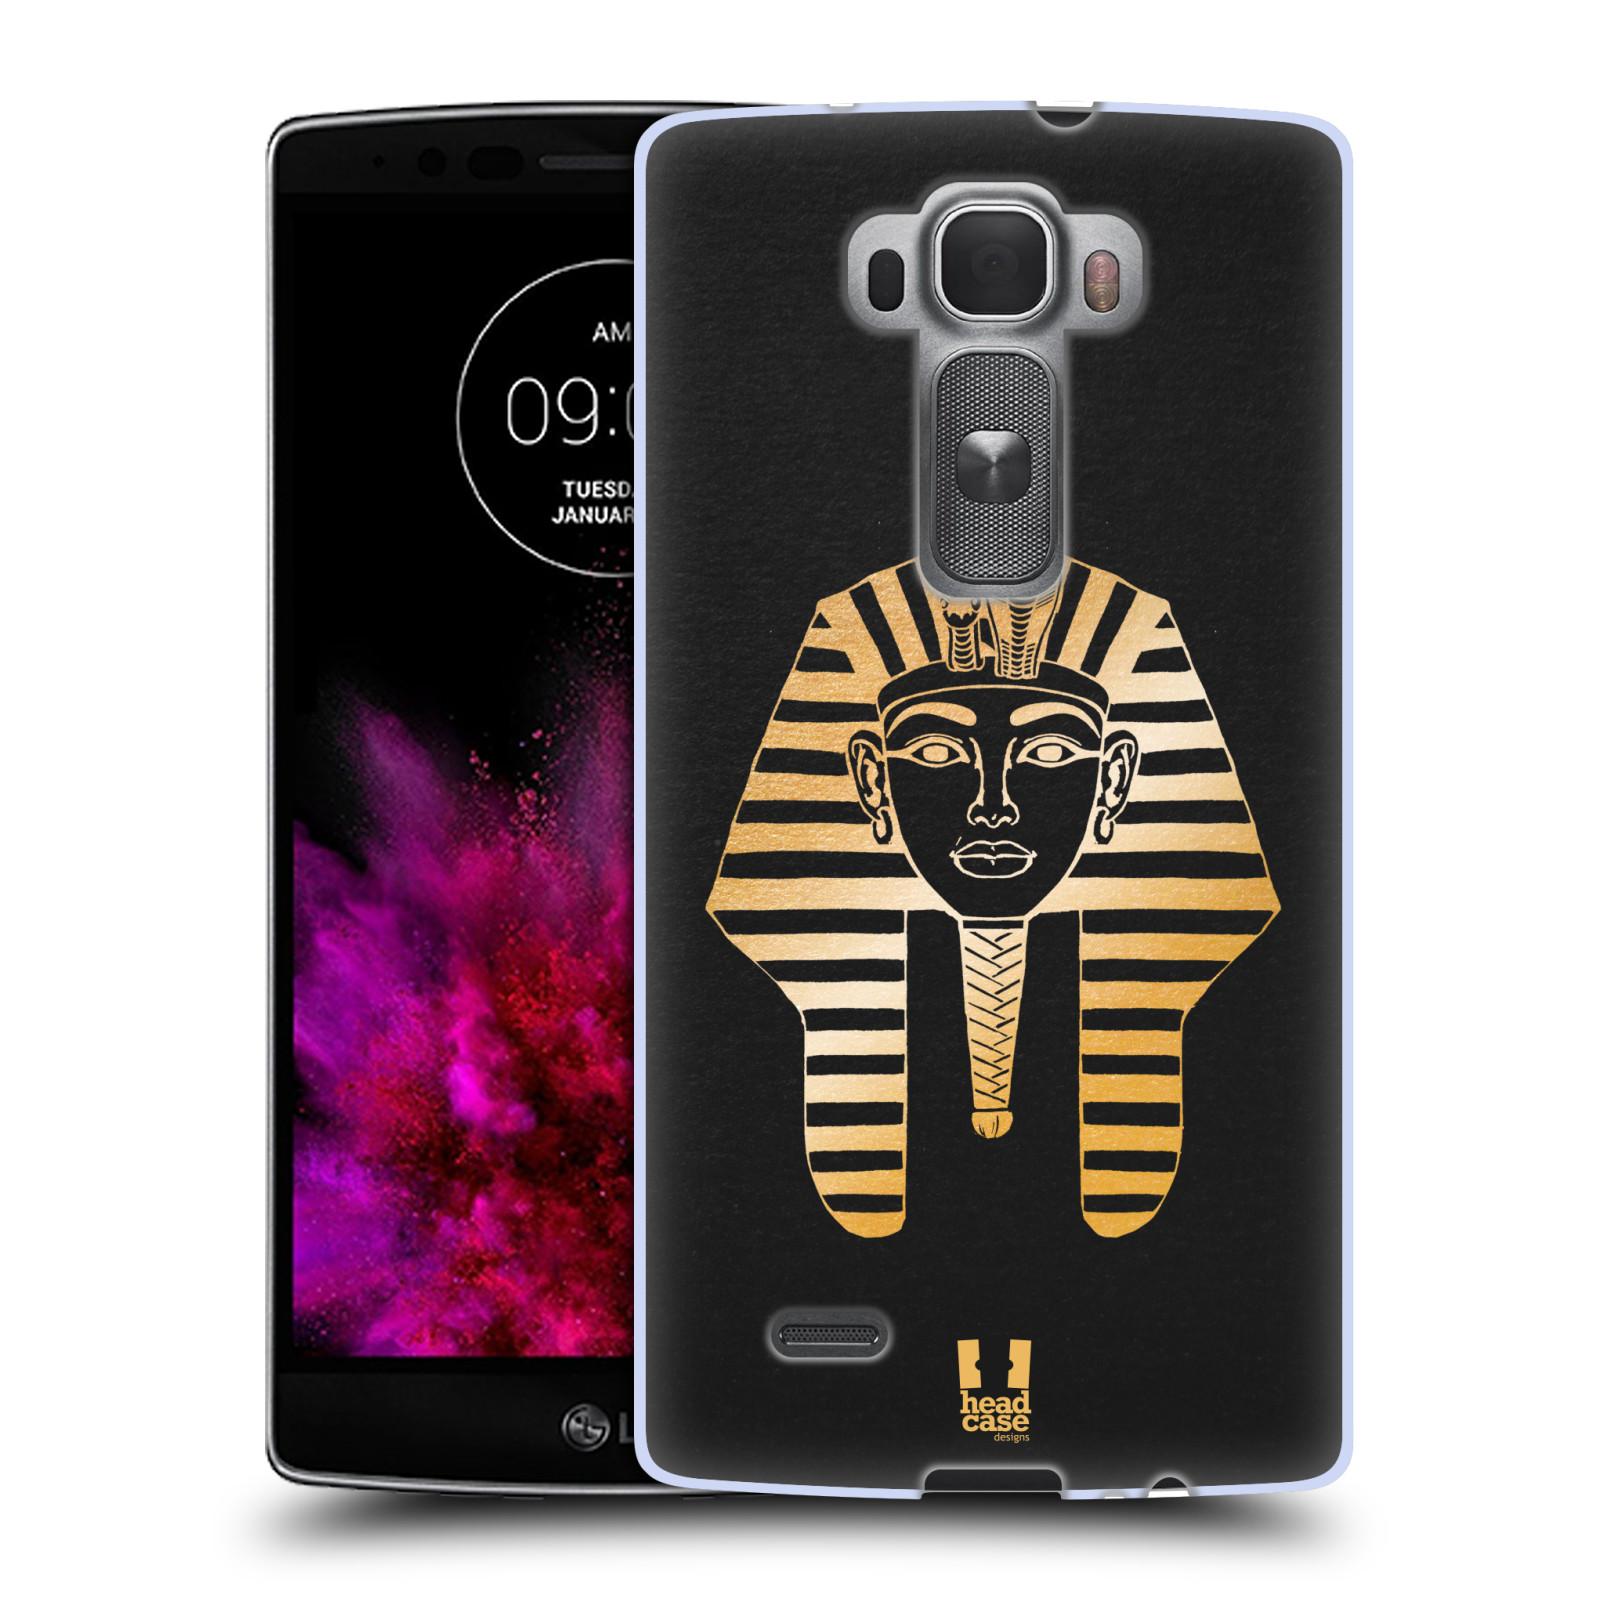 Silikonové pouzdro na mobil LG G Flex 2 HEAD CASE EGYPT FARAON (Silikonový kryt či obal na mobilní telefon LG G Flex 2 H955)